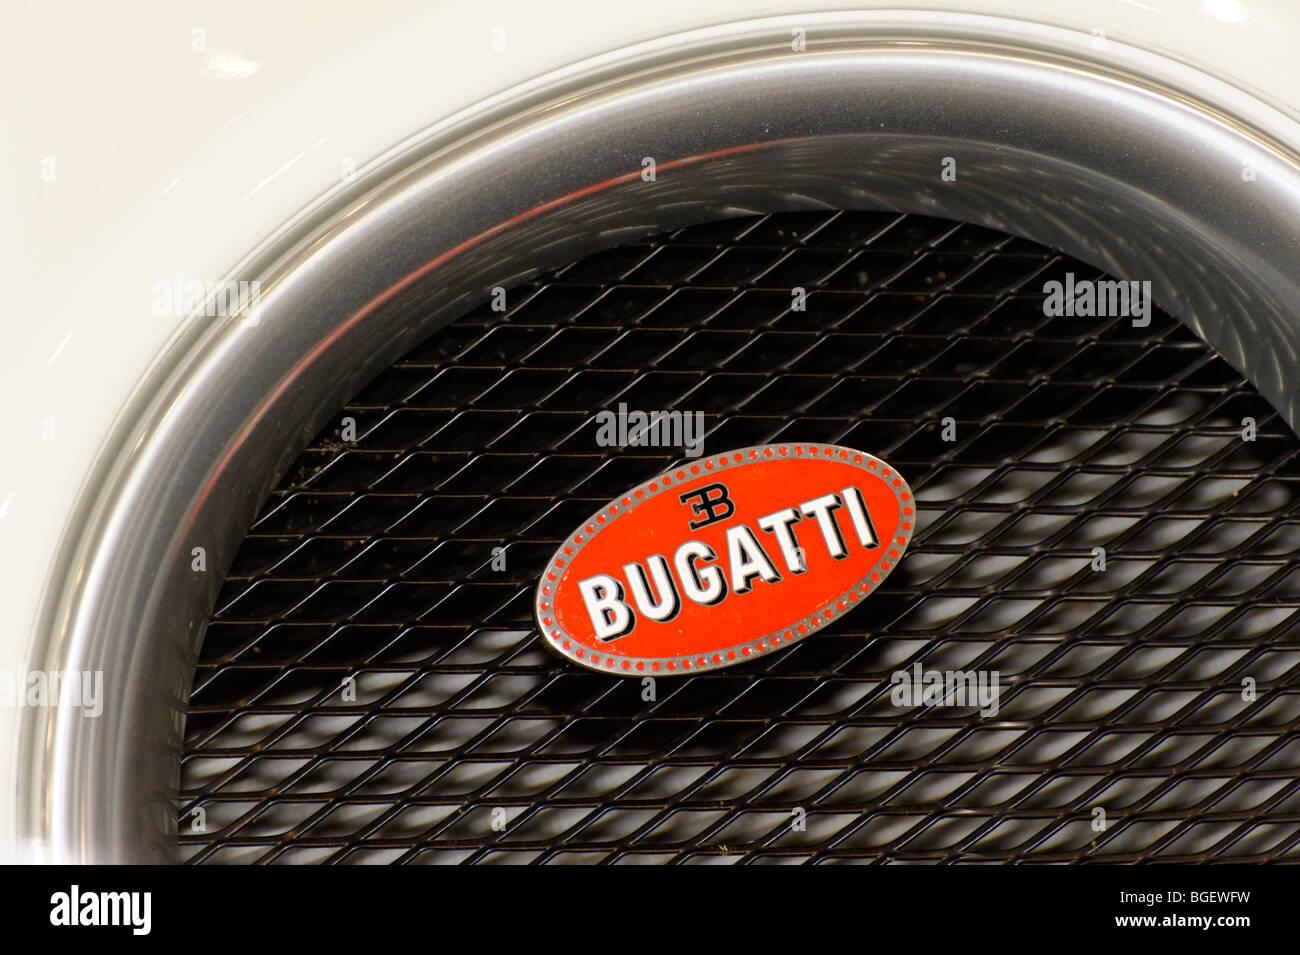 Bugatti Veyron super car badge. - Stock Image